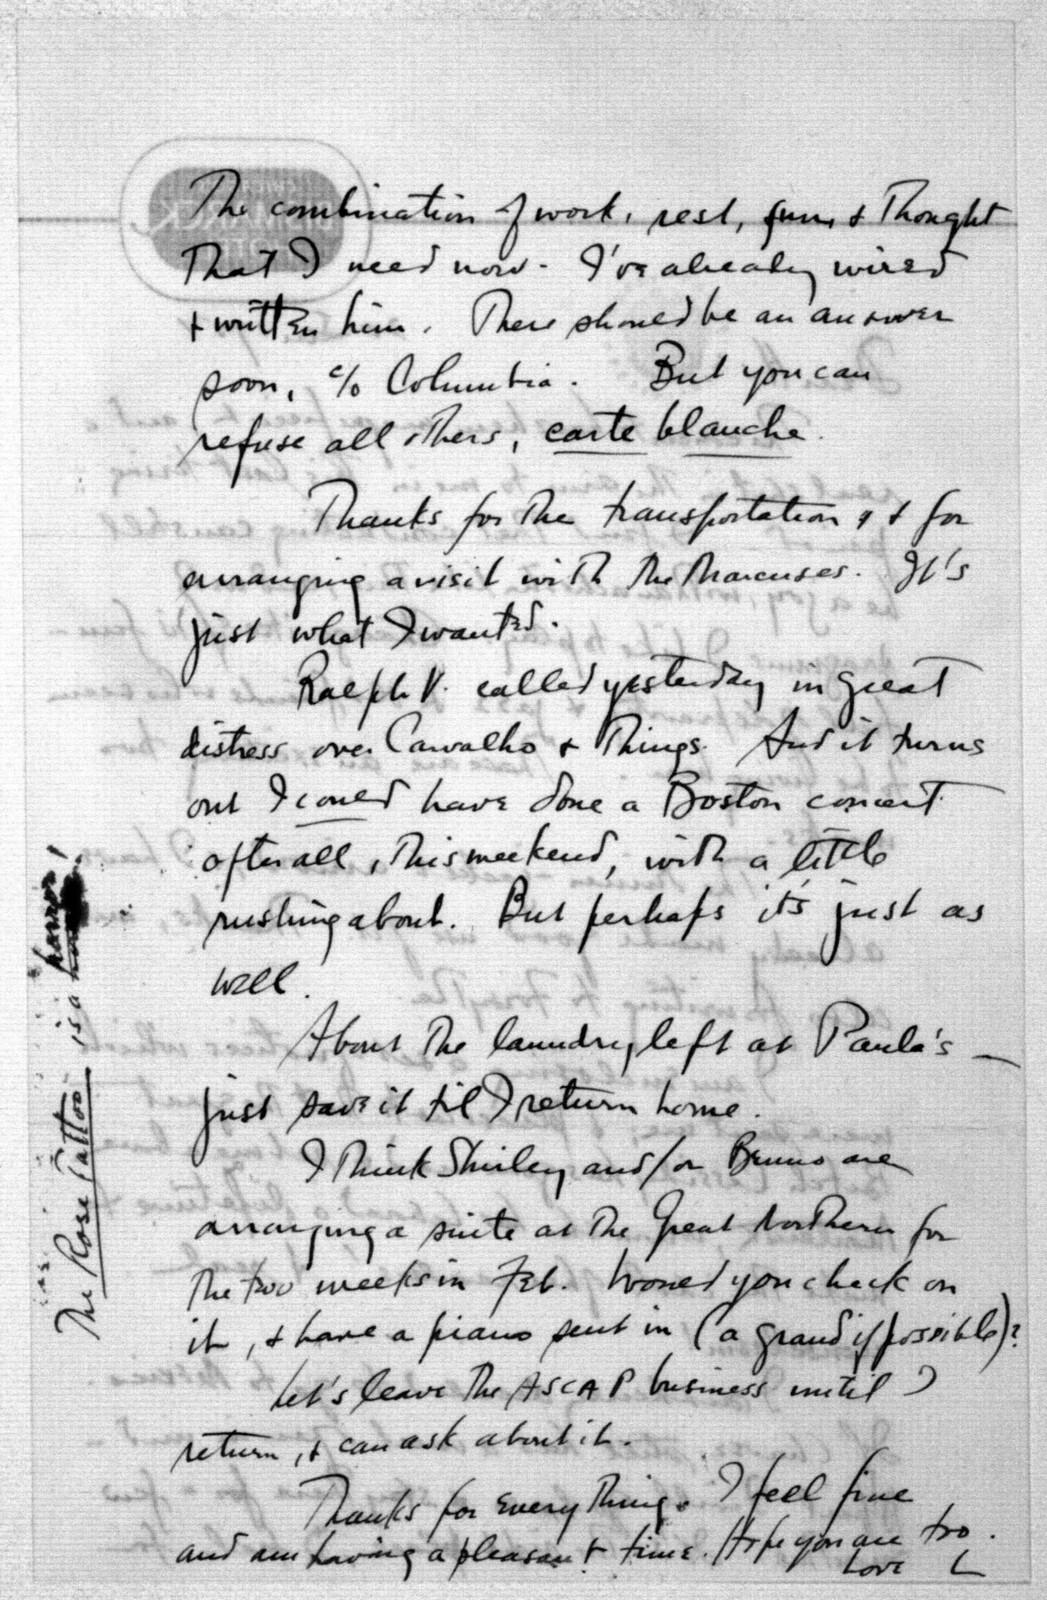 Letter from Leonard Bernstein to Helen Coates, January 20, 1951